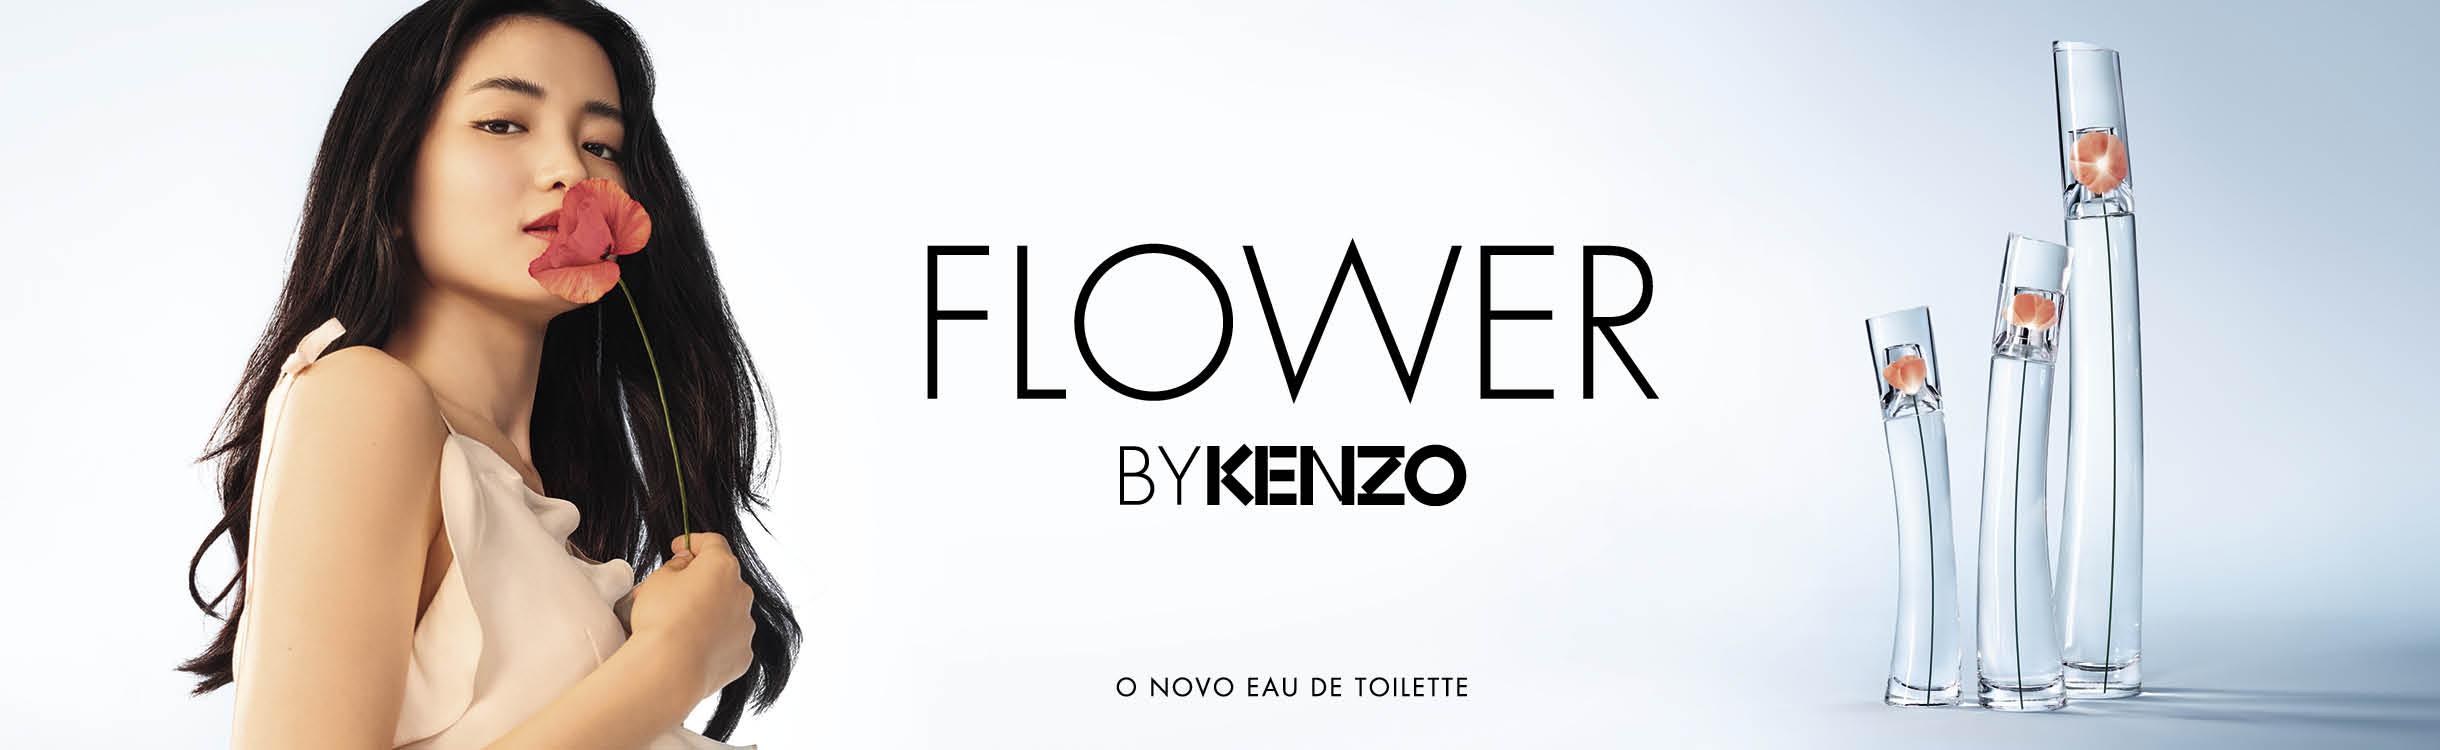 Perfumes e Perfumaria Kenzo Femininos